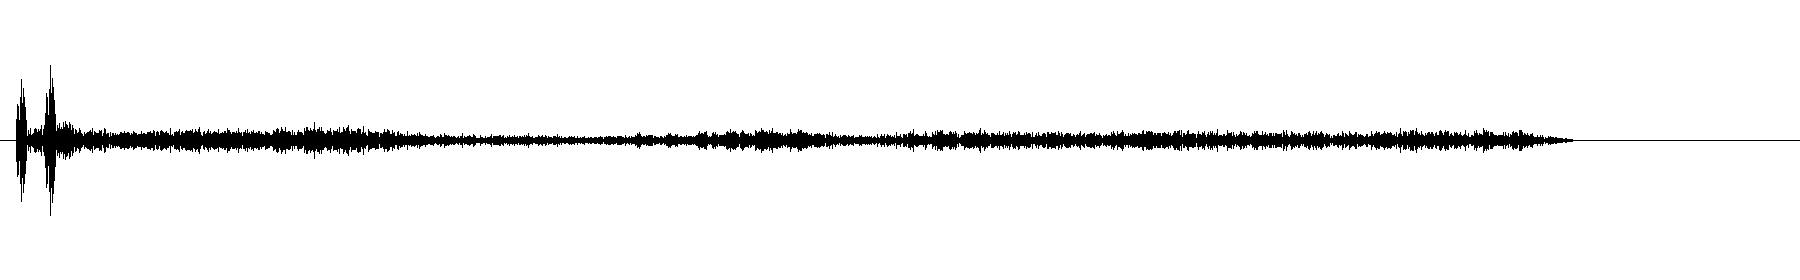 perc 1 15